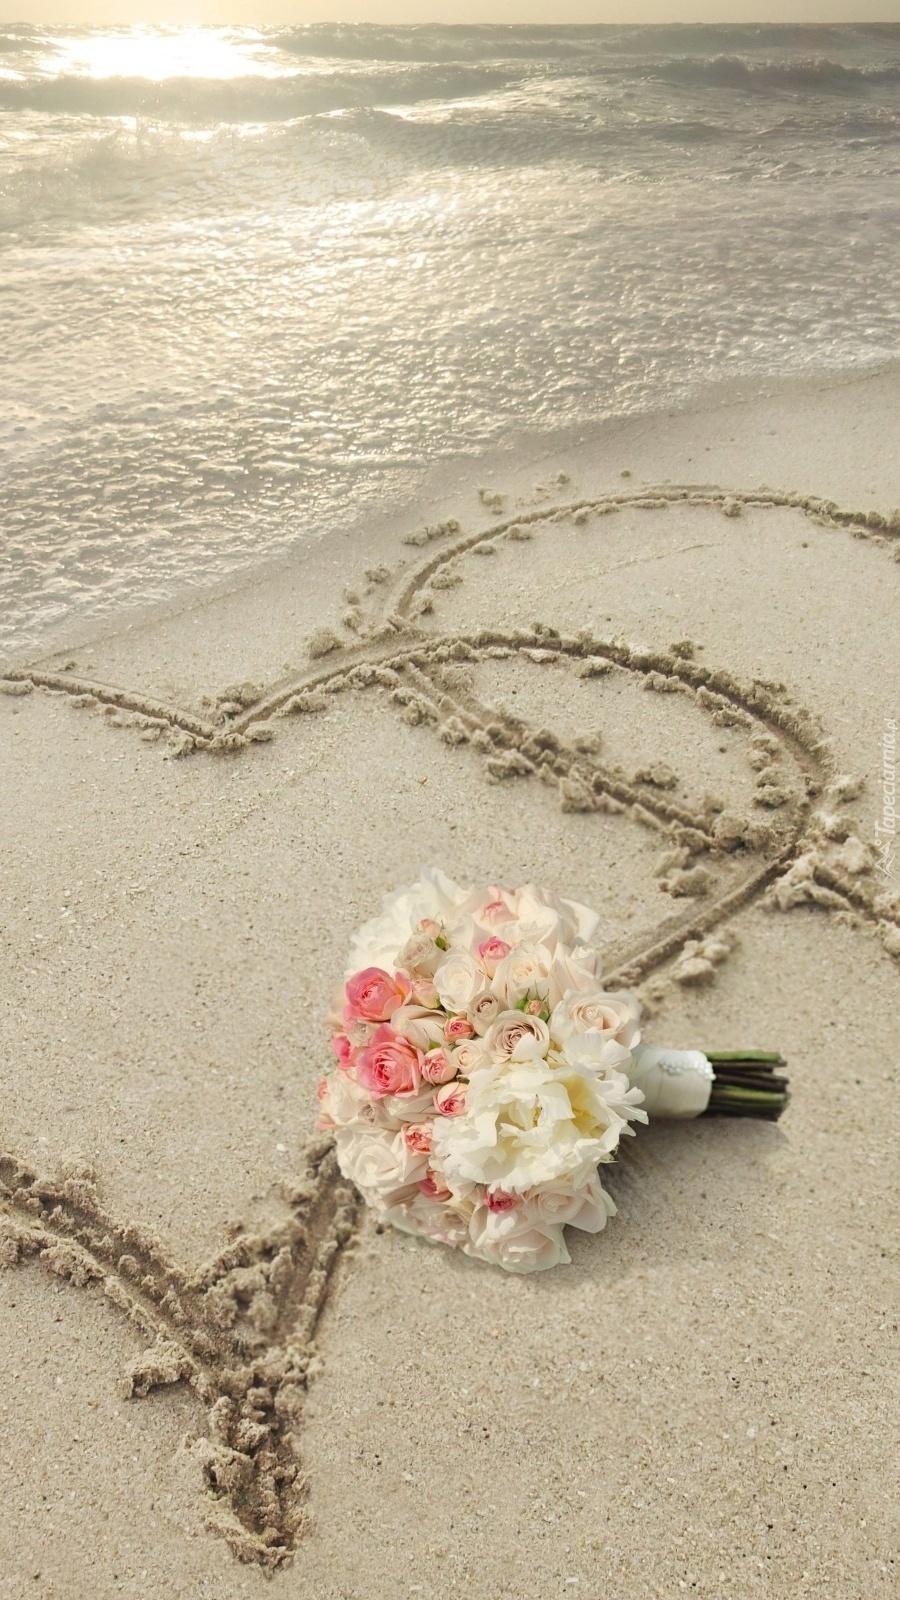 Serca na piasku obok wiązanki